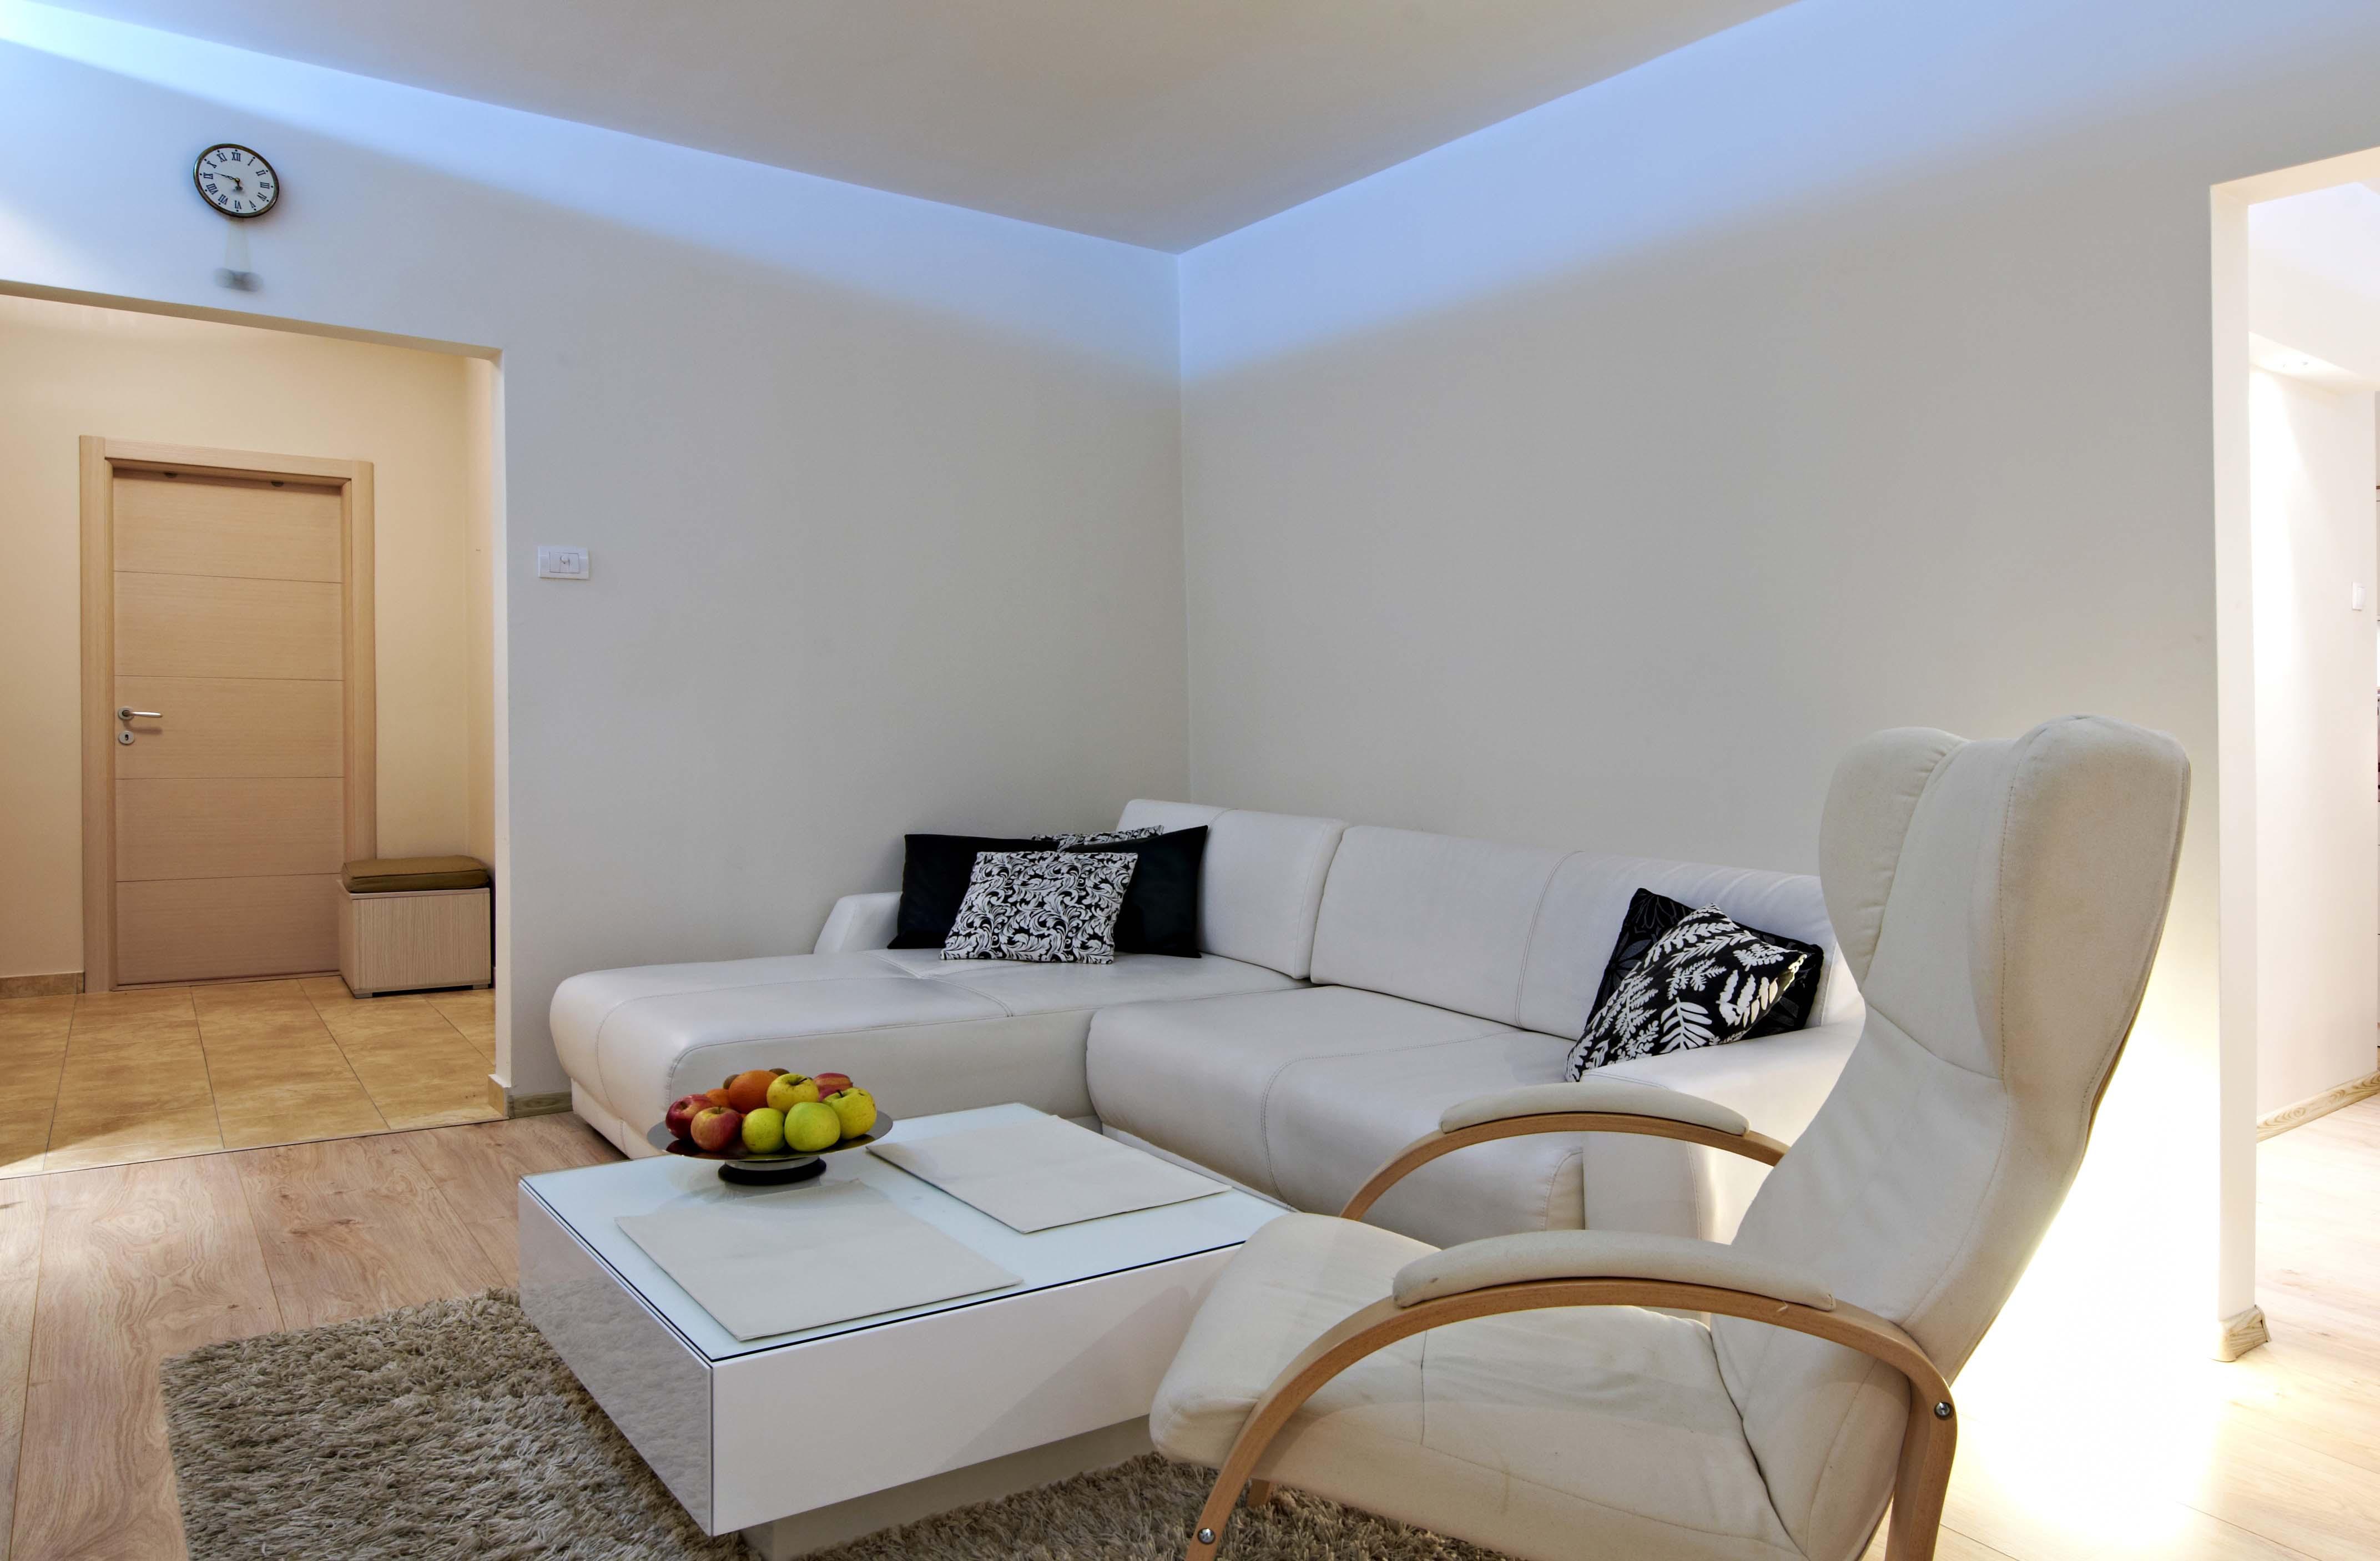 Iluminacion led salon awesome conjunto de muebles de saln for Muebles de salon con luz led